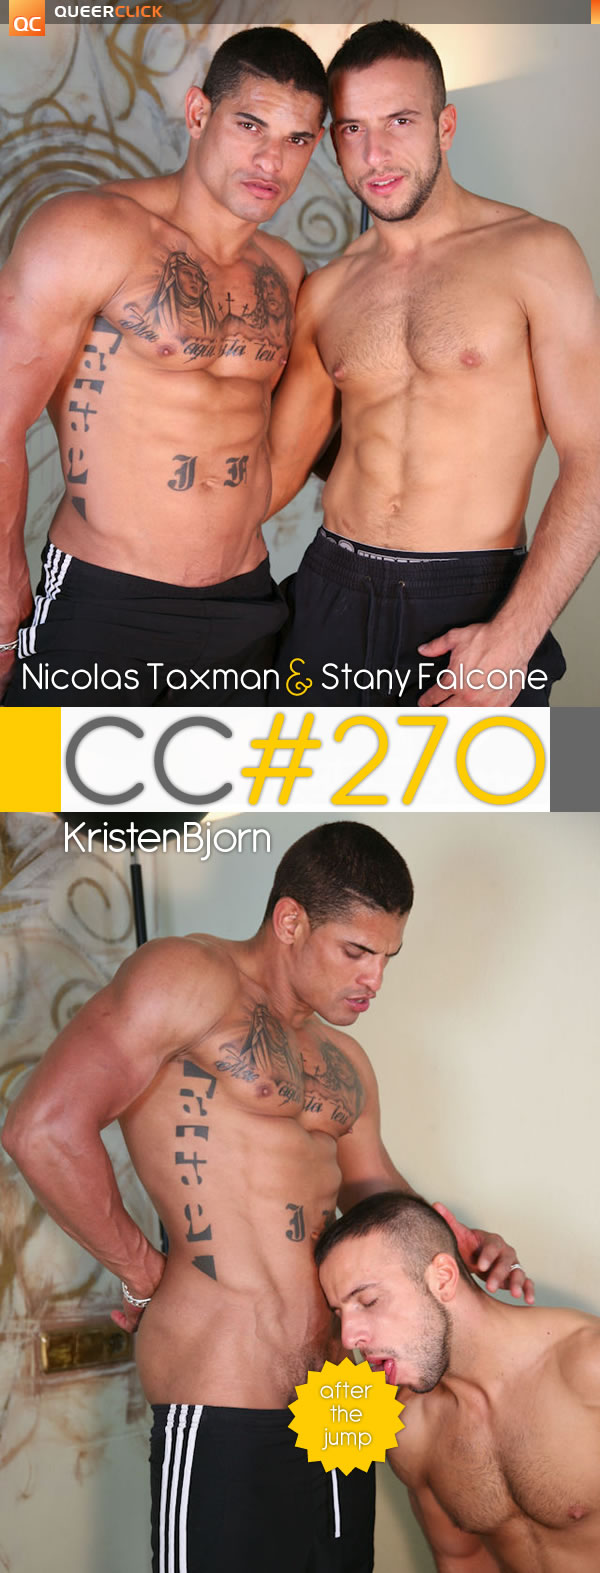 Kristen Bjorn: Nicolas Taxman & Stany Falcone